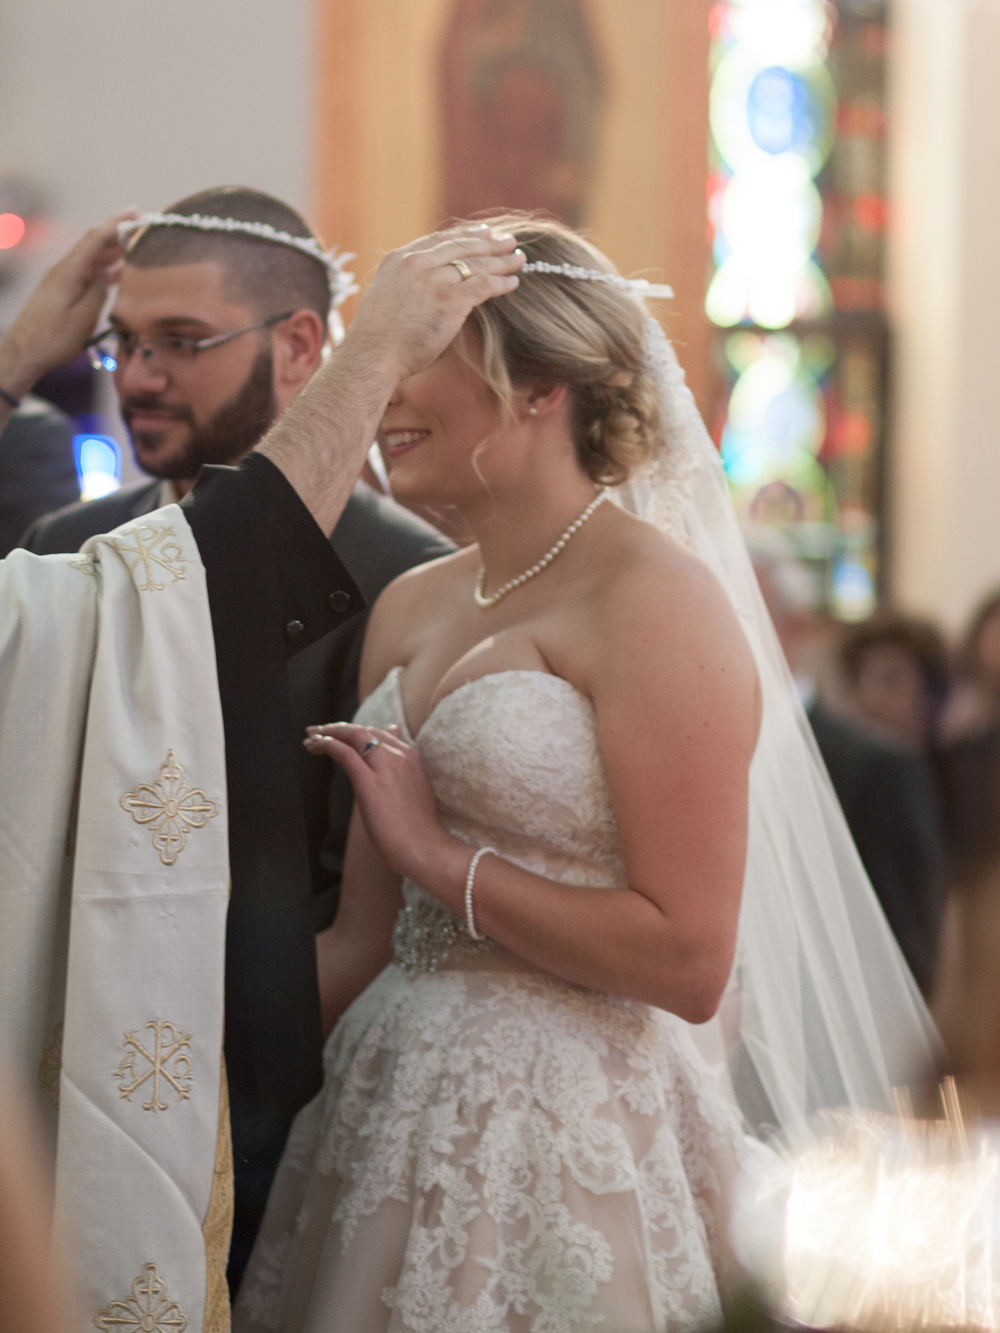 Houston wedding photographer - Christine Gosch - Houston film photographer - greek wedding in Houston - Annunciation Greek Orthodox church in Houston, Texas - Houston wedding planner -31.jpg